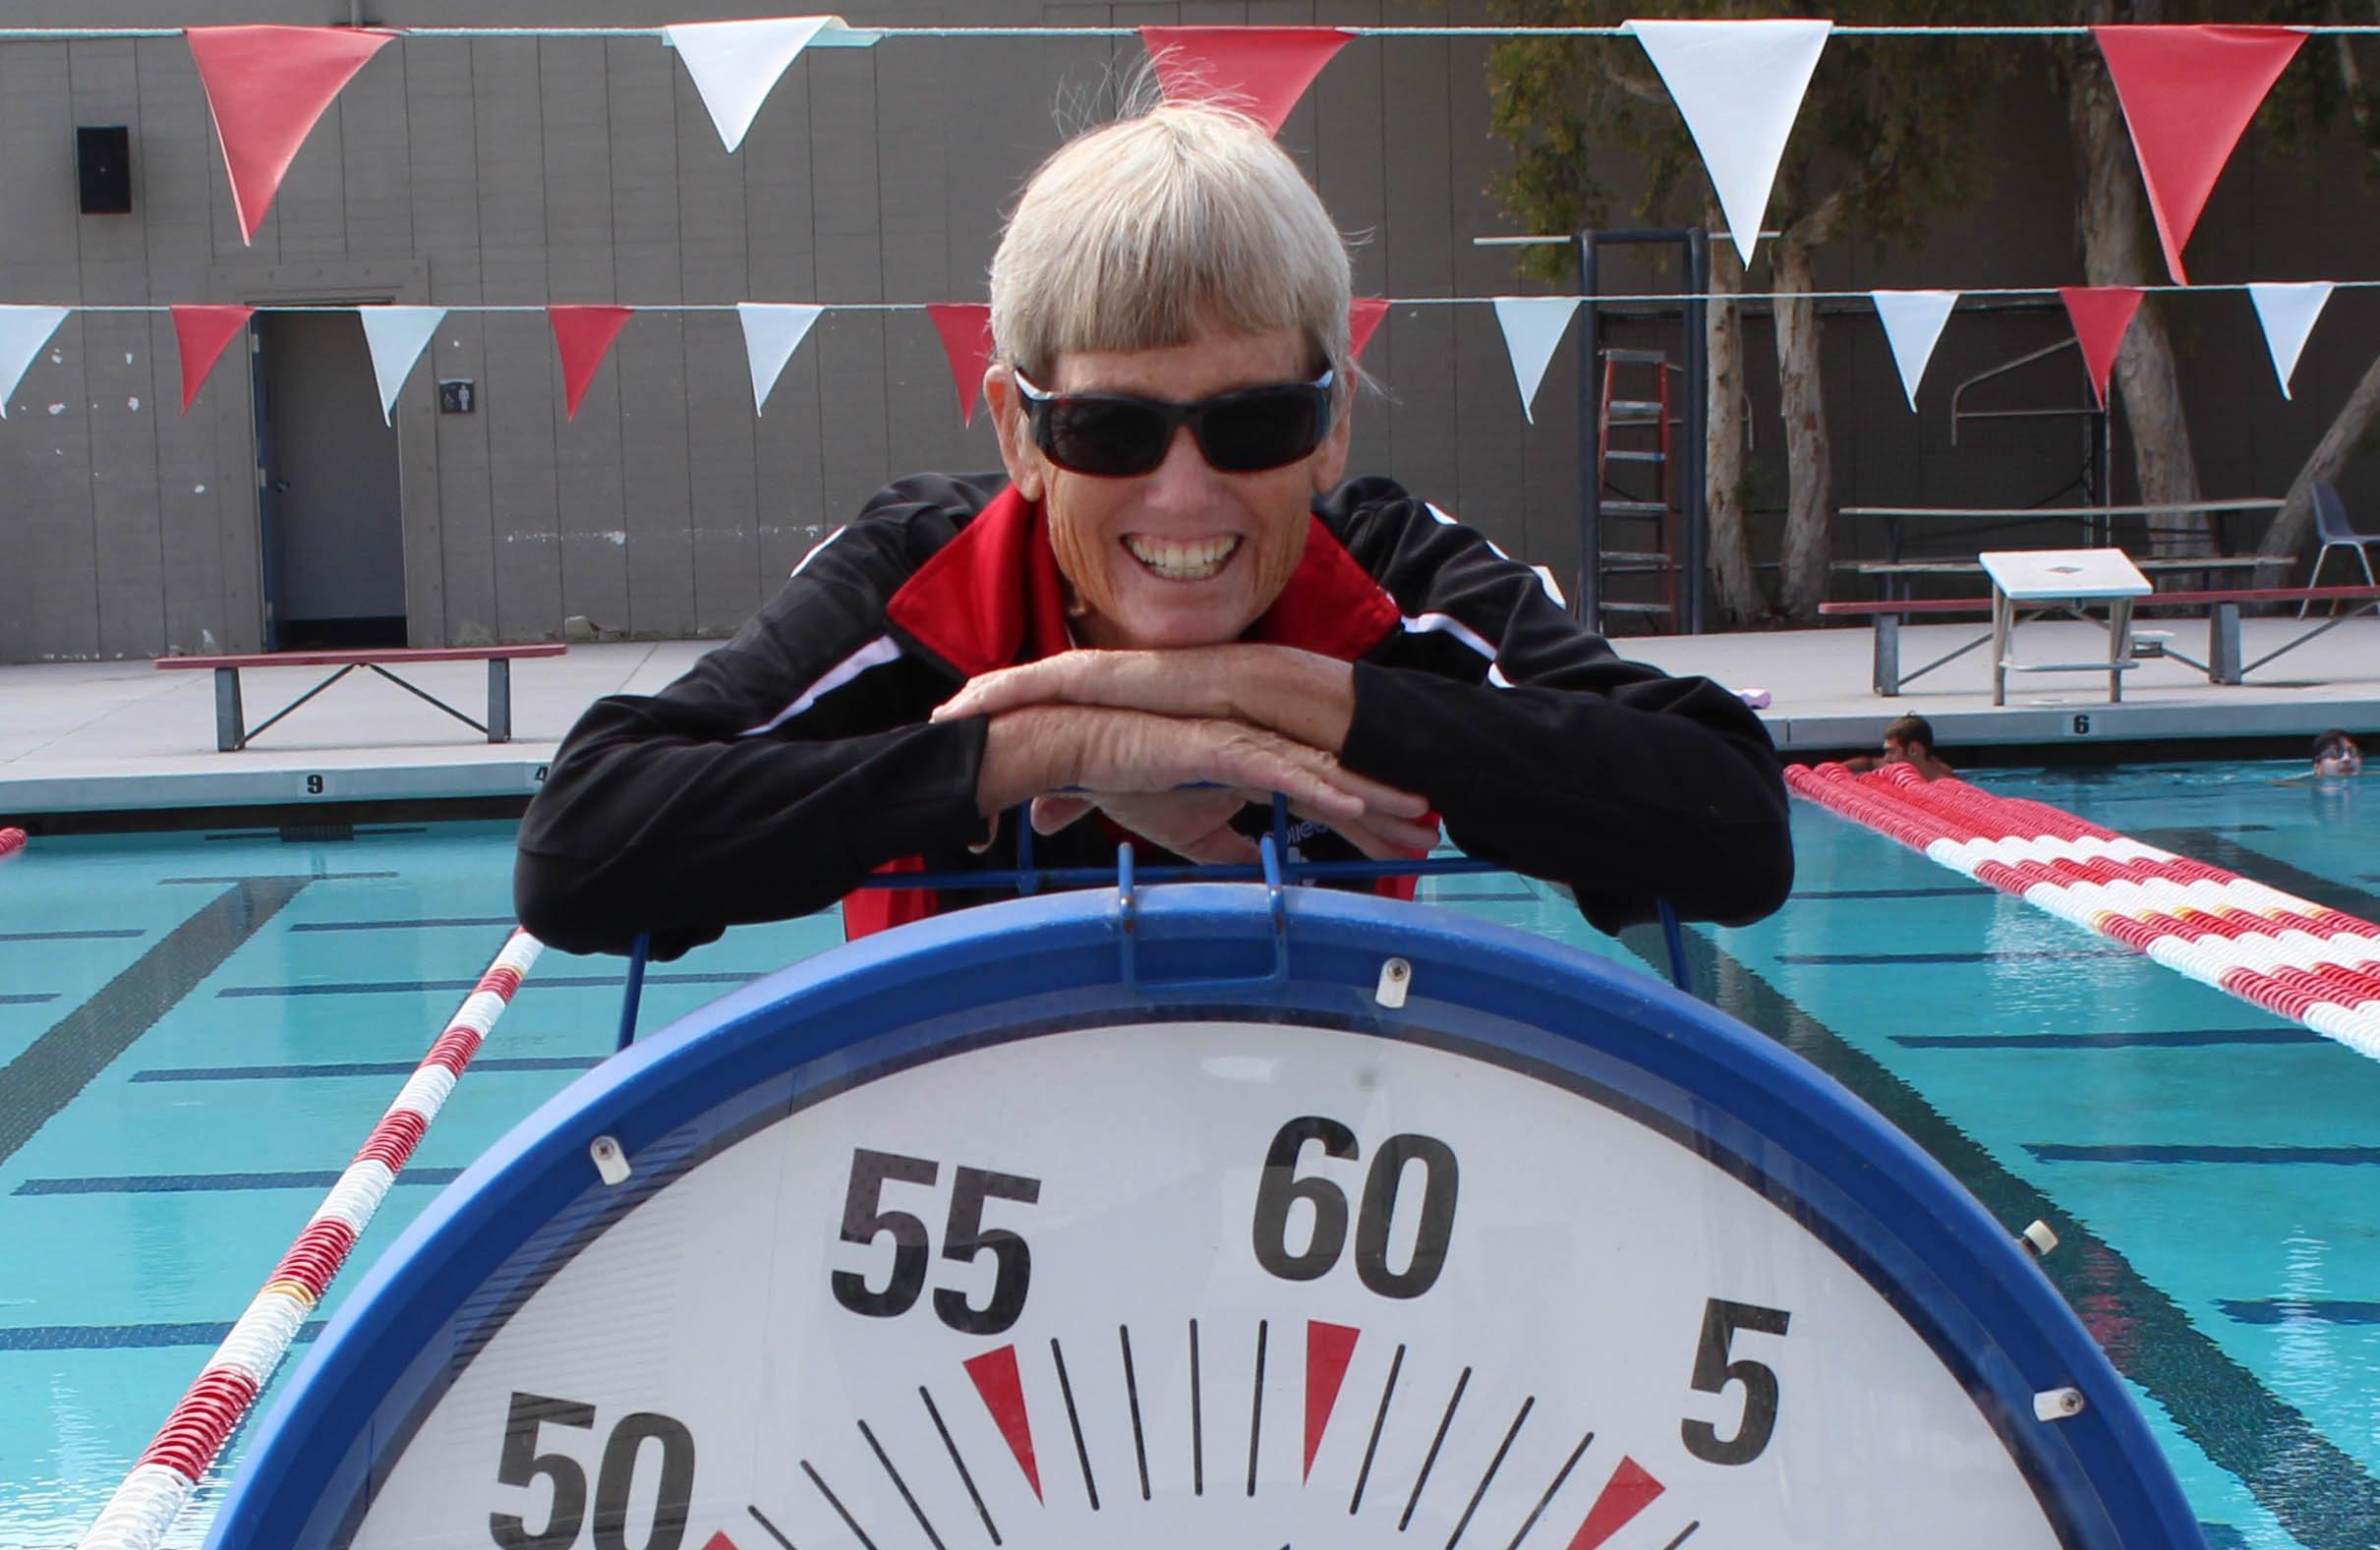 Swim coach makes a splash